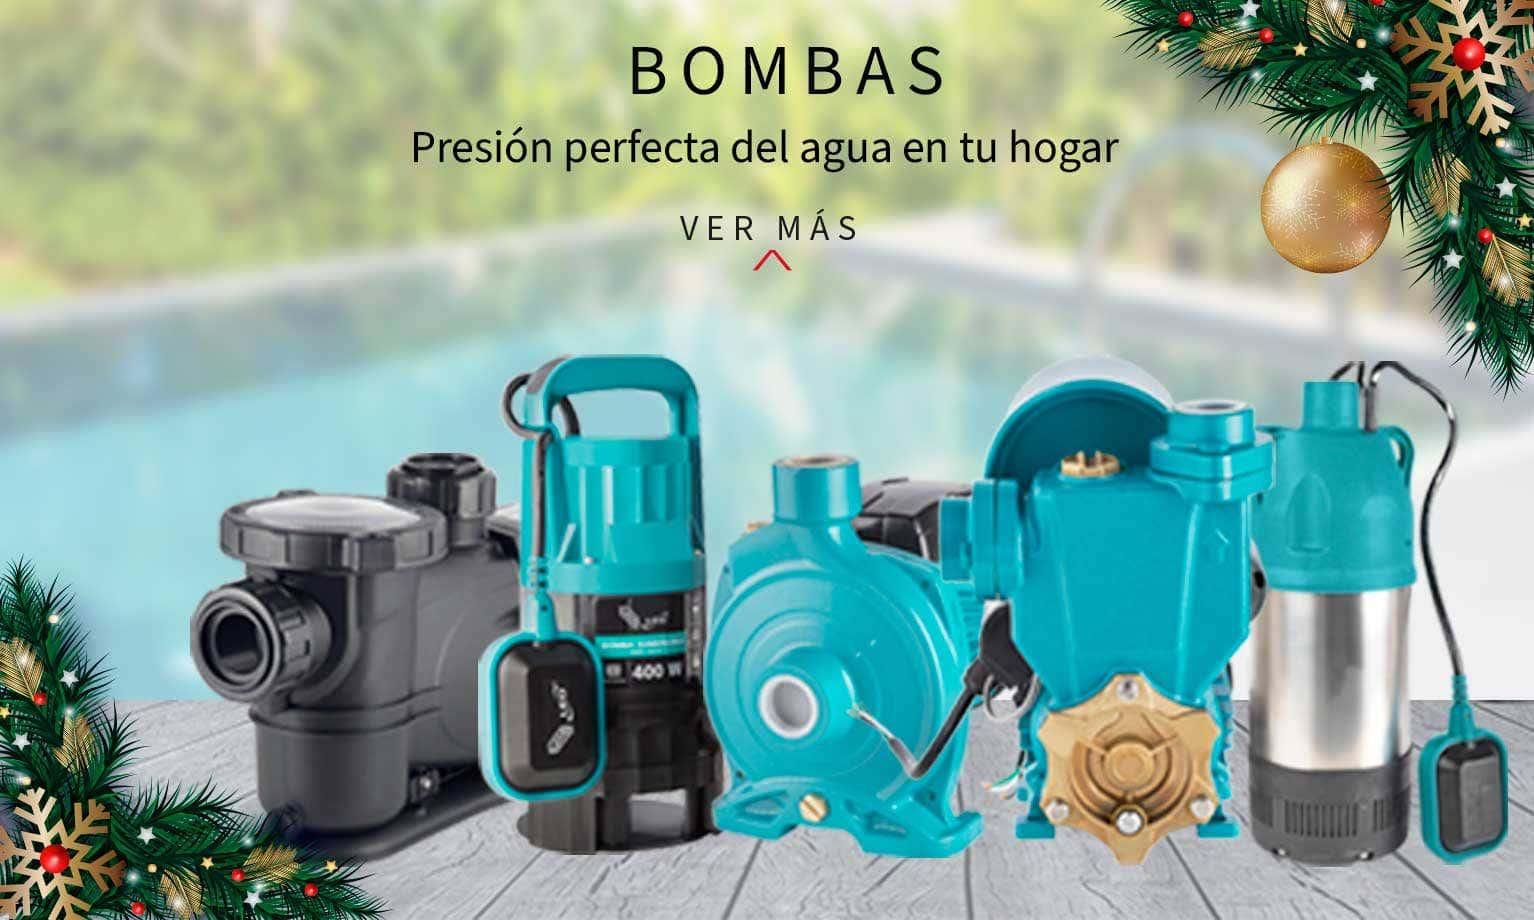 Bombas, presión perfecta del agua en tu hogar